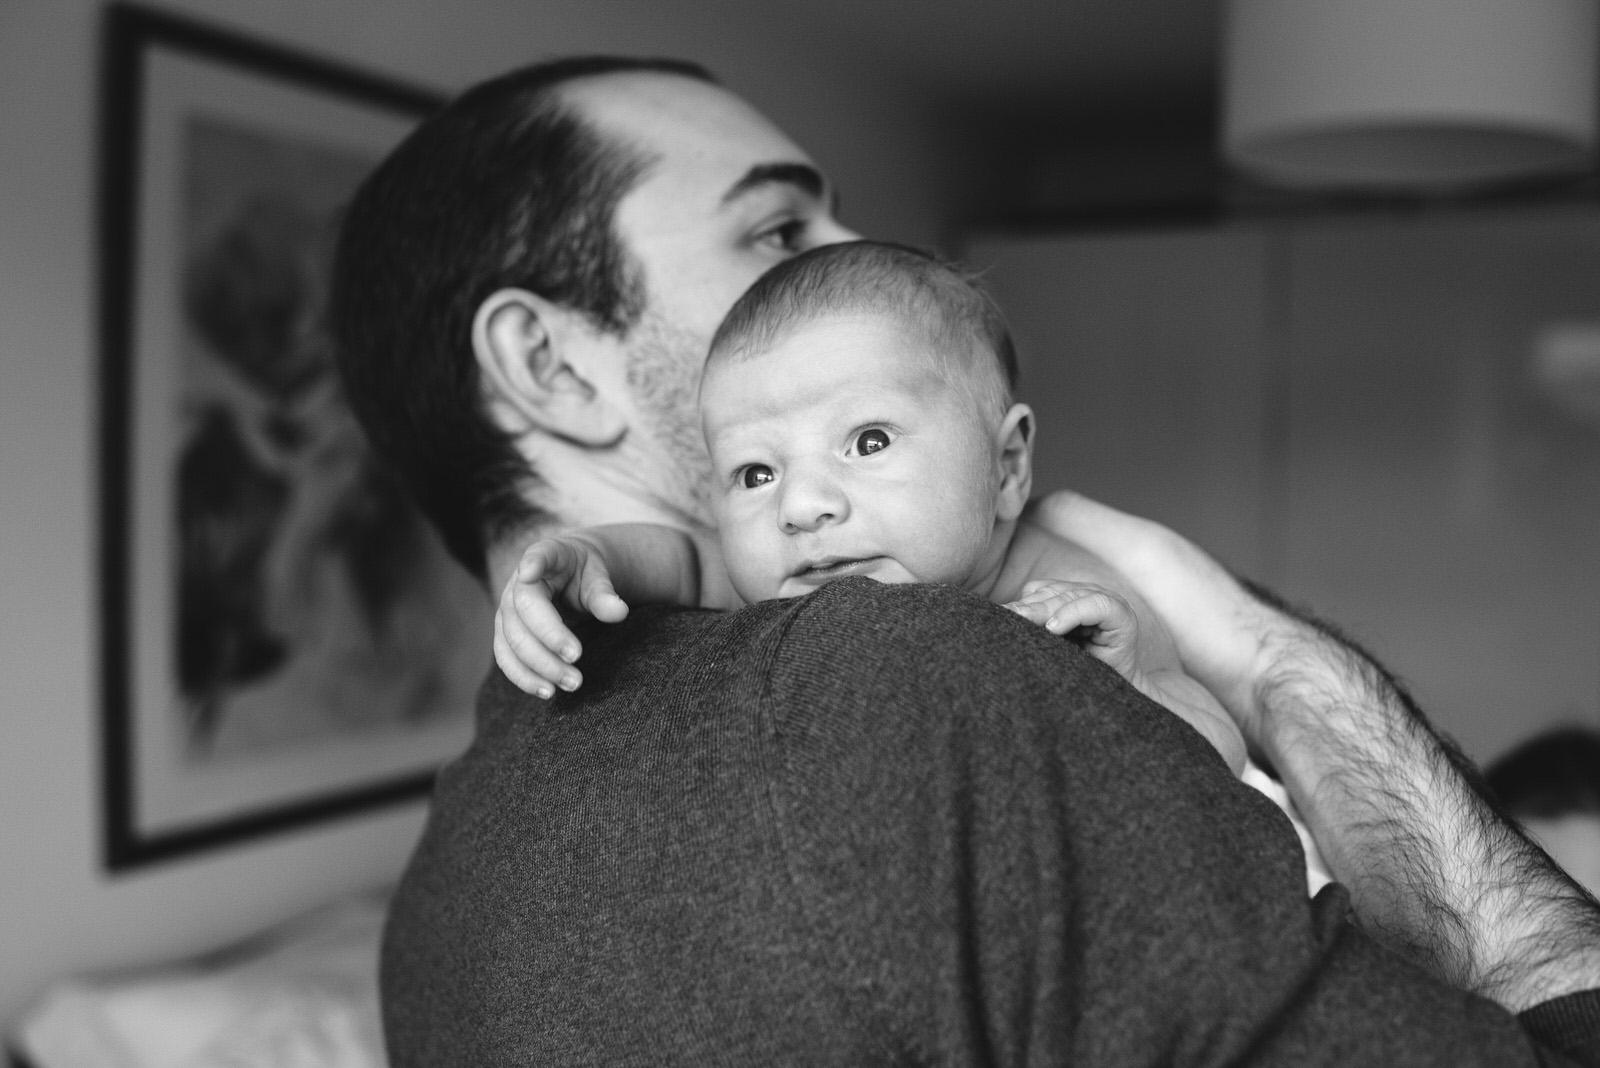 Newborn Baby looks out over dad shoulder - Uckfield newborn photoshoot